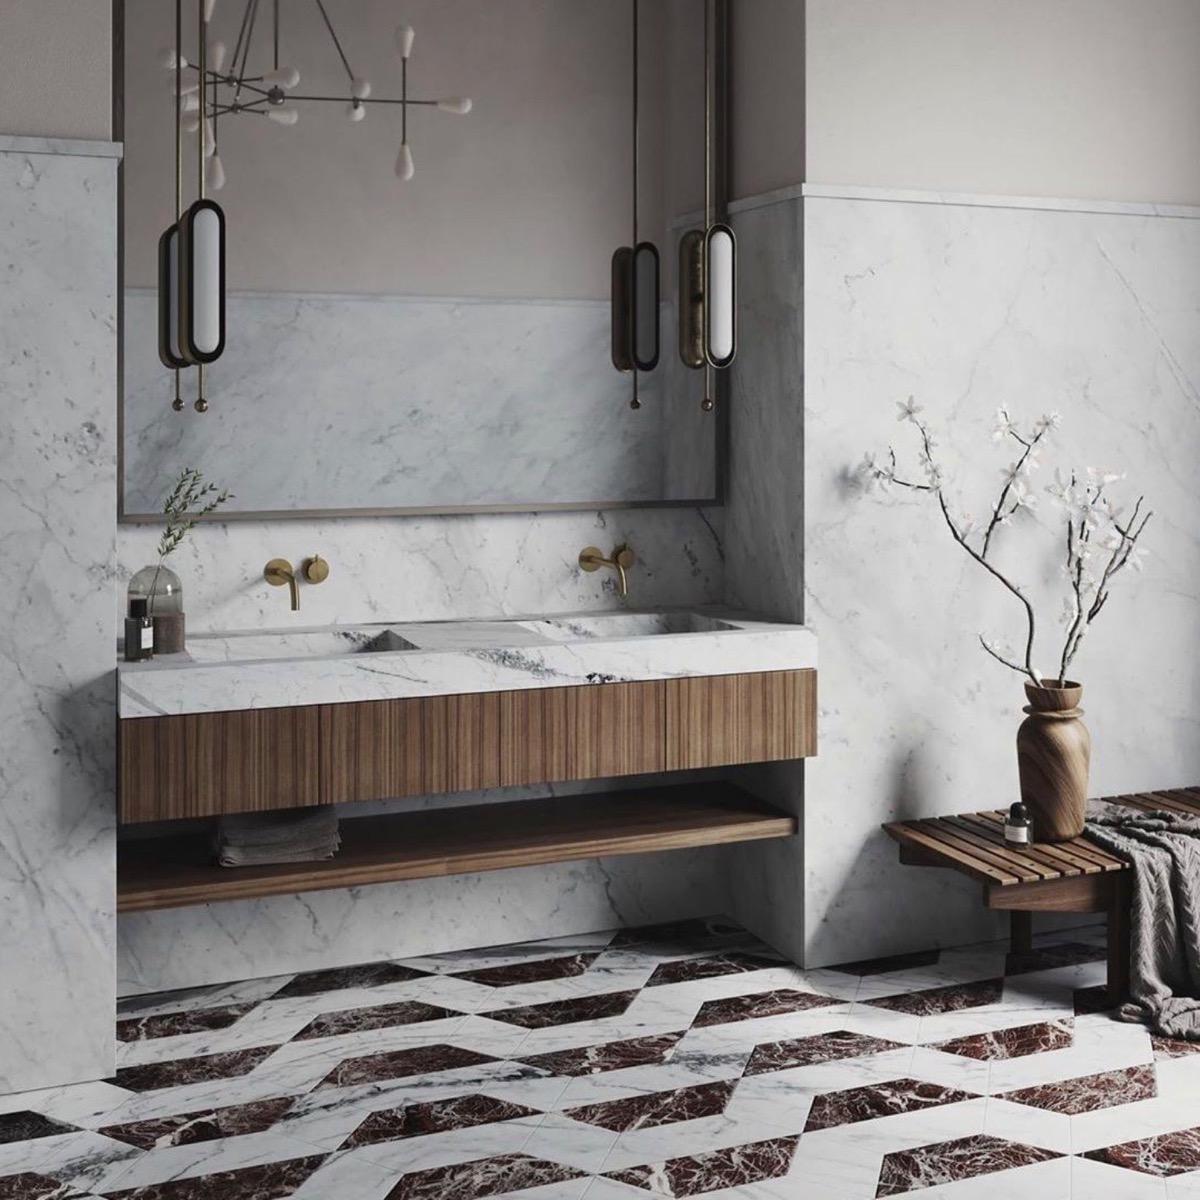 double-vanity-with-towel-shelf